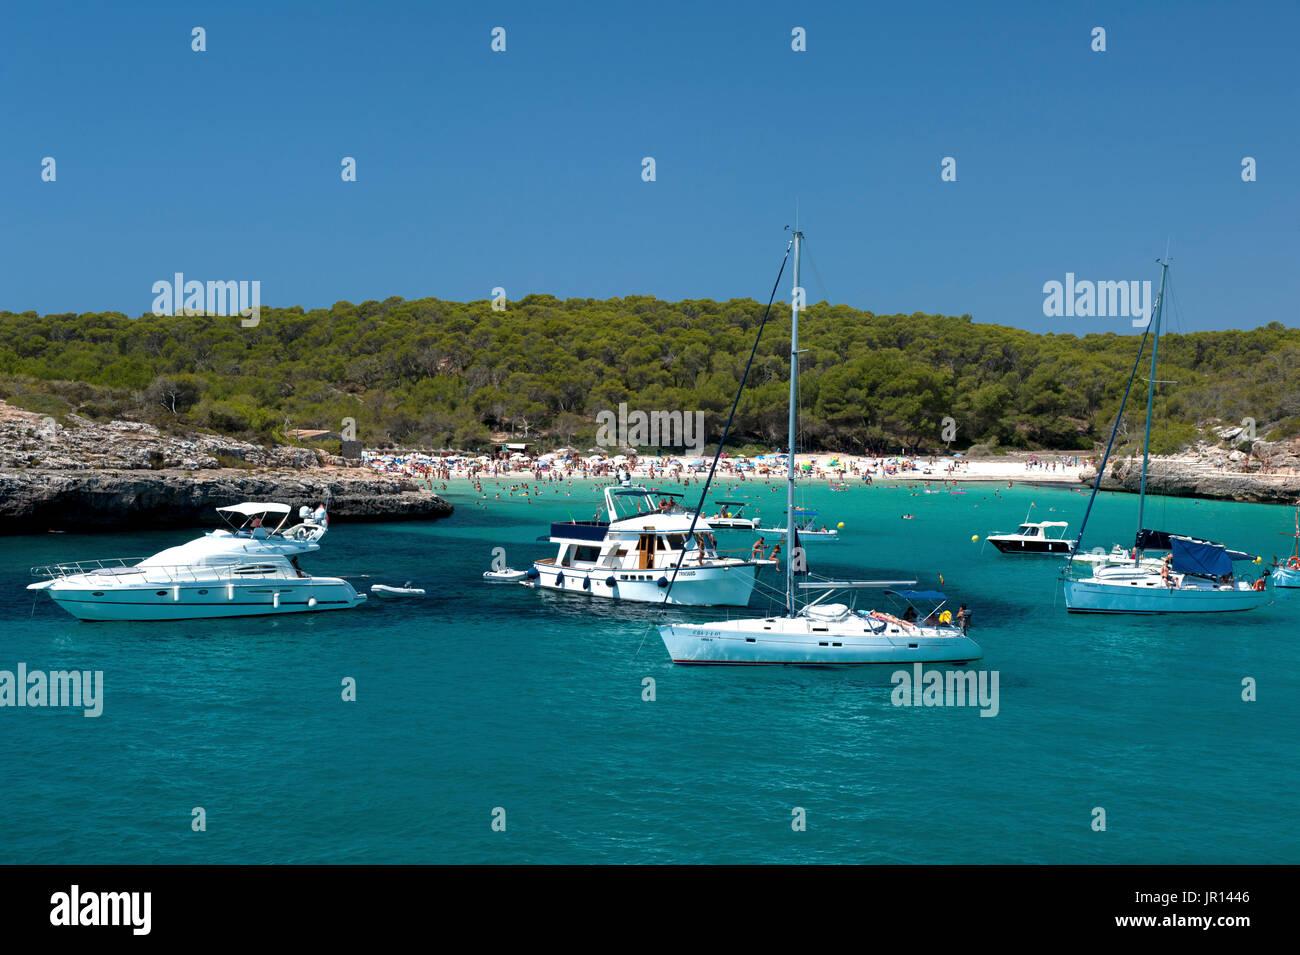 Expensive yachts anchored in Cala Mondrago, Mallorca, Spain - Stock Image